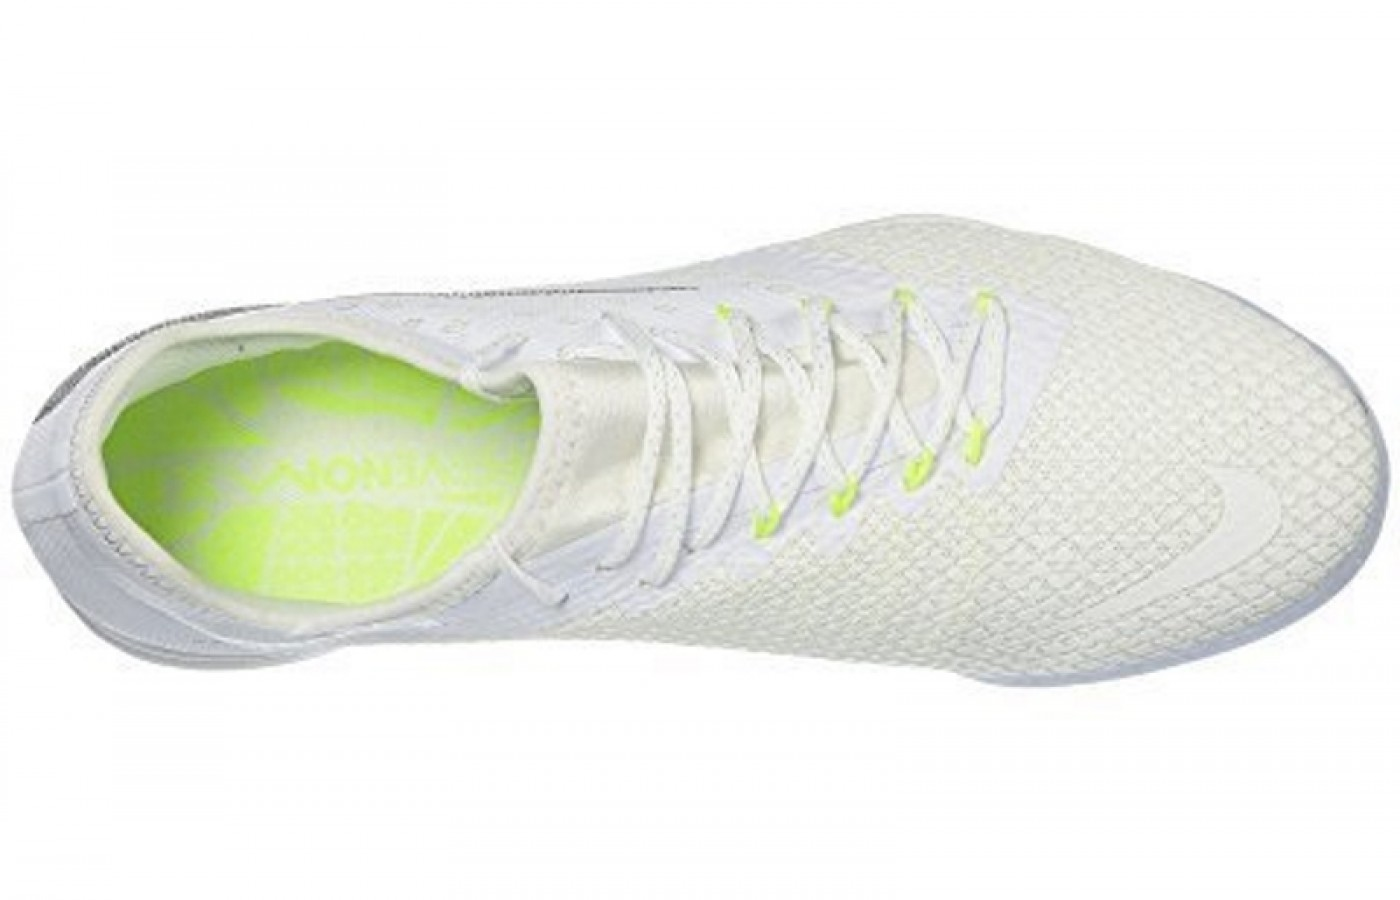 Nike Zoom Hypervenom X 3 Pro IC Top View